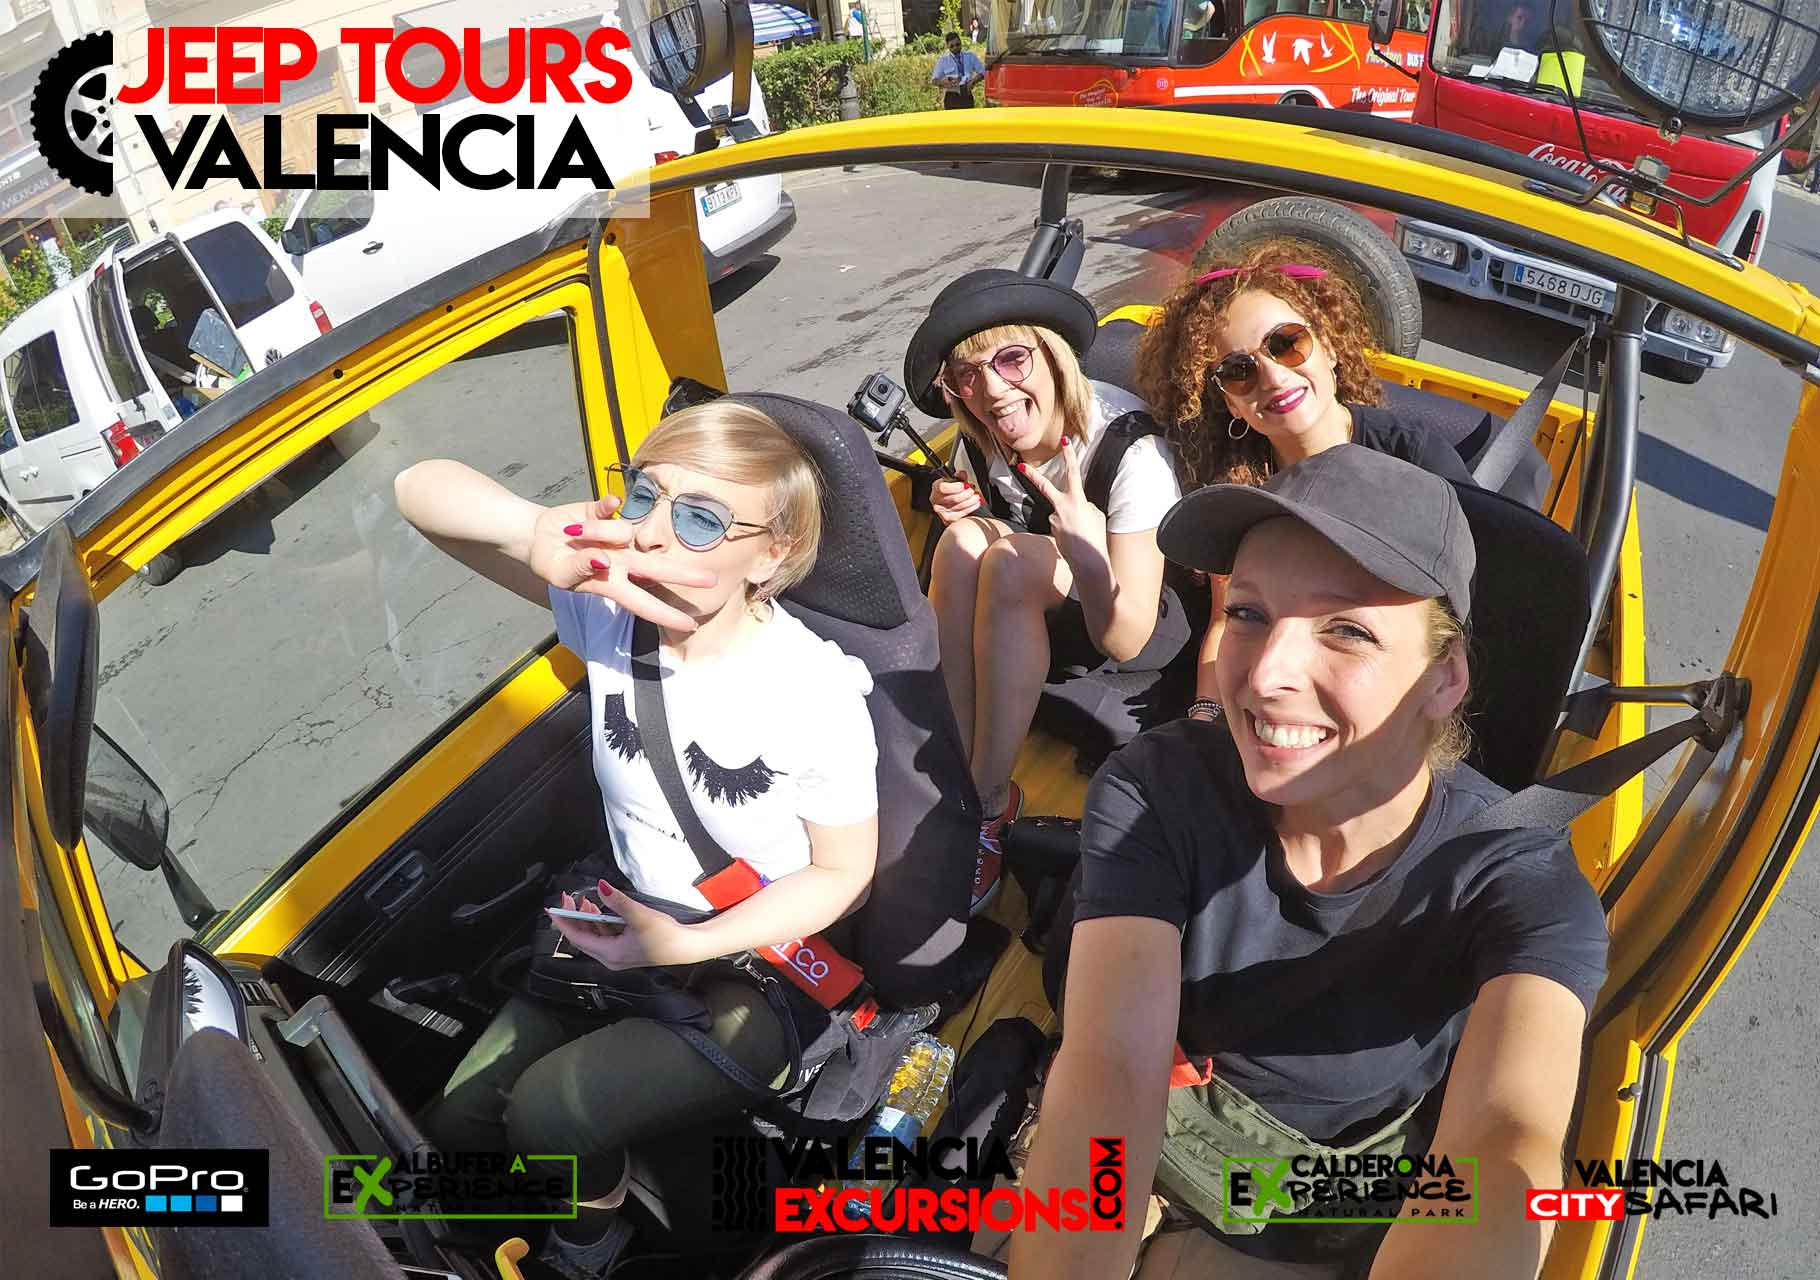 Valencia jeep tours